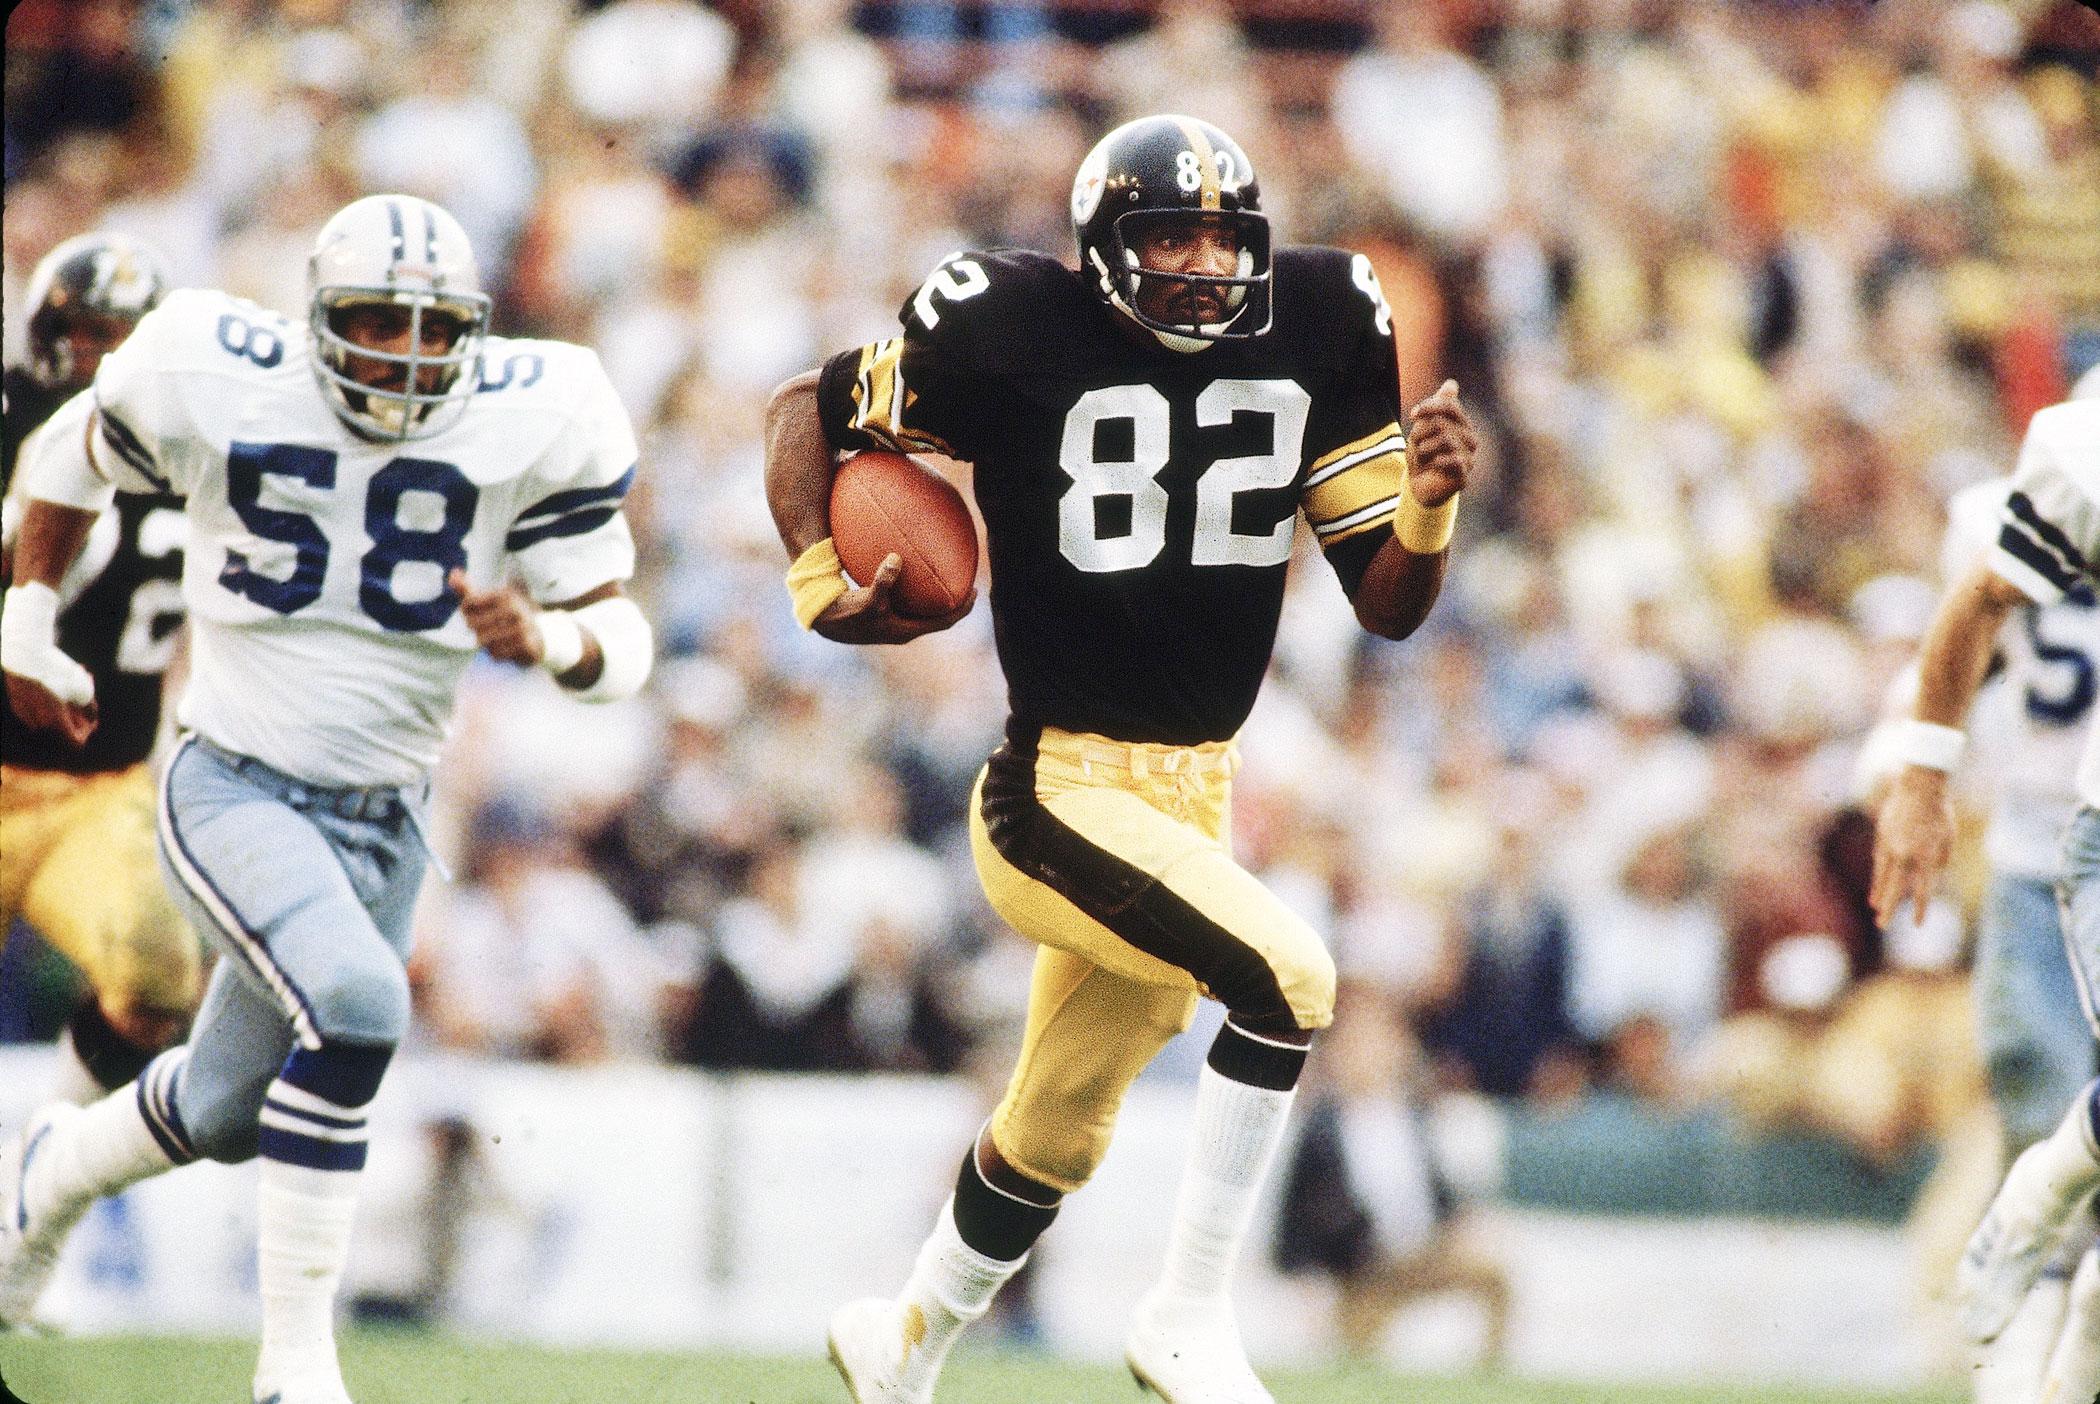 Super Bowl XIII, Jan. 21, 1979                               Pittsburgh Steelers vs Dallas Cowboys in Miami